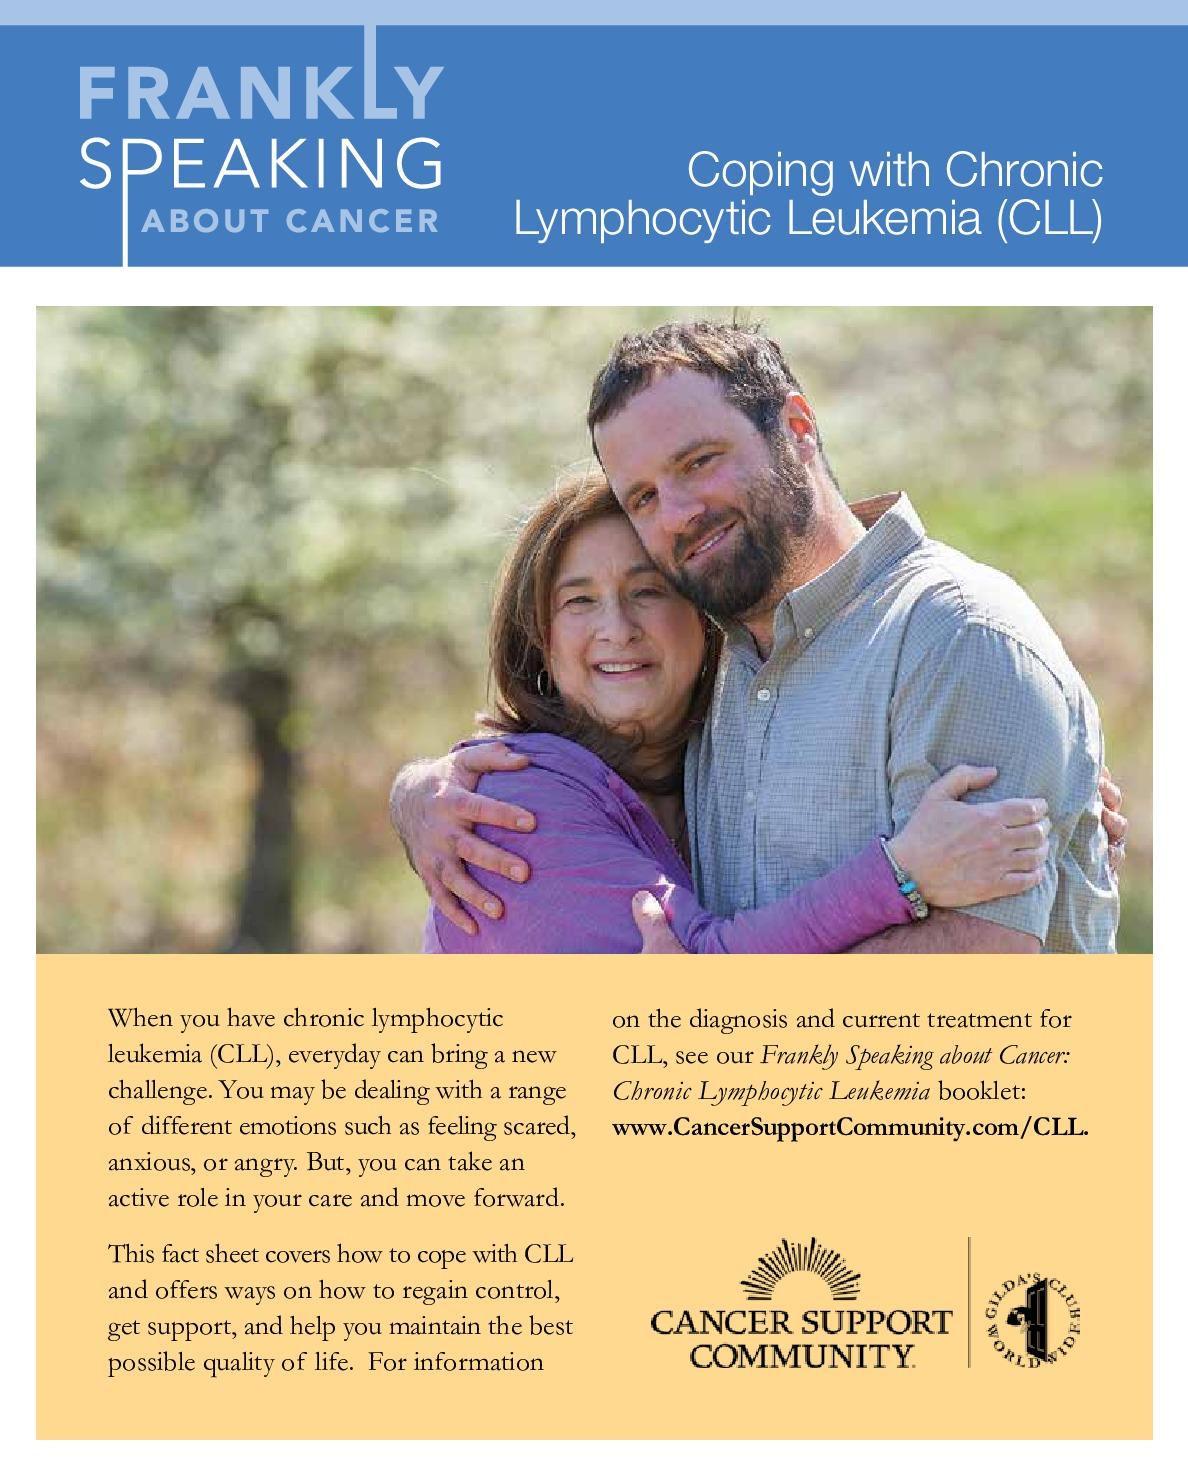 Coping with Chronic Lymphocytic Leukemia (CLL)